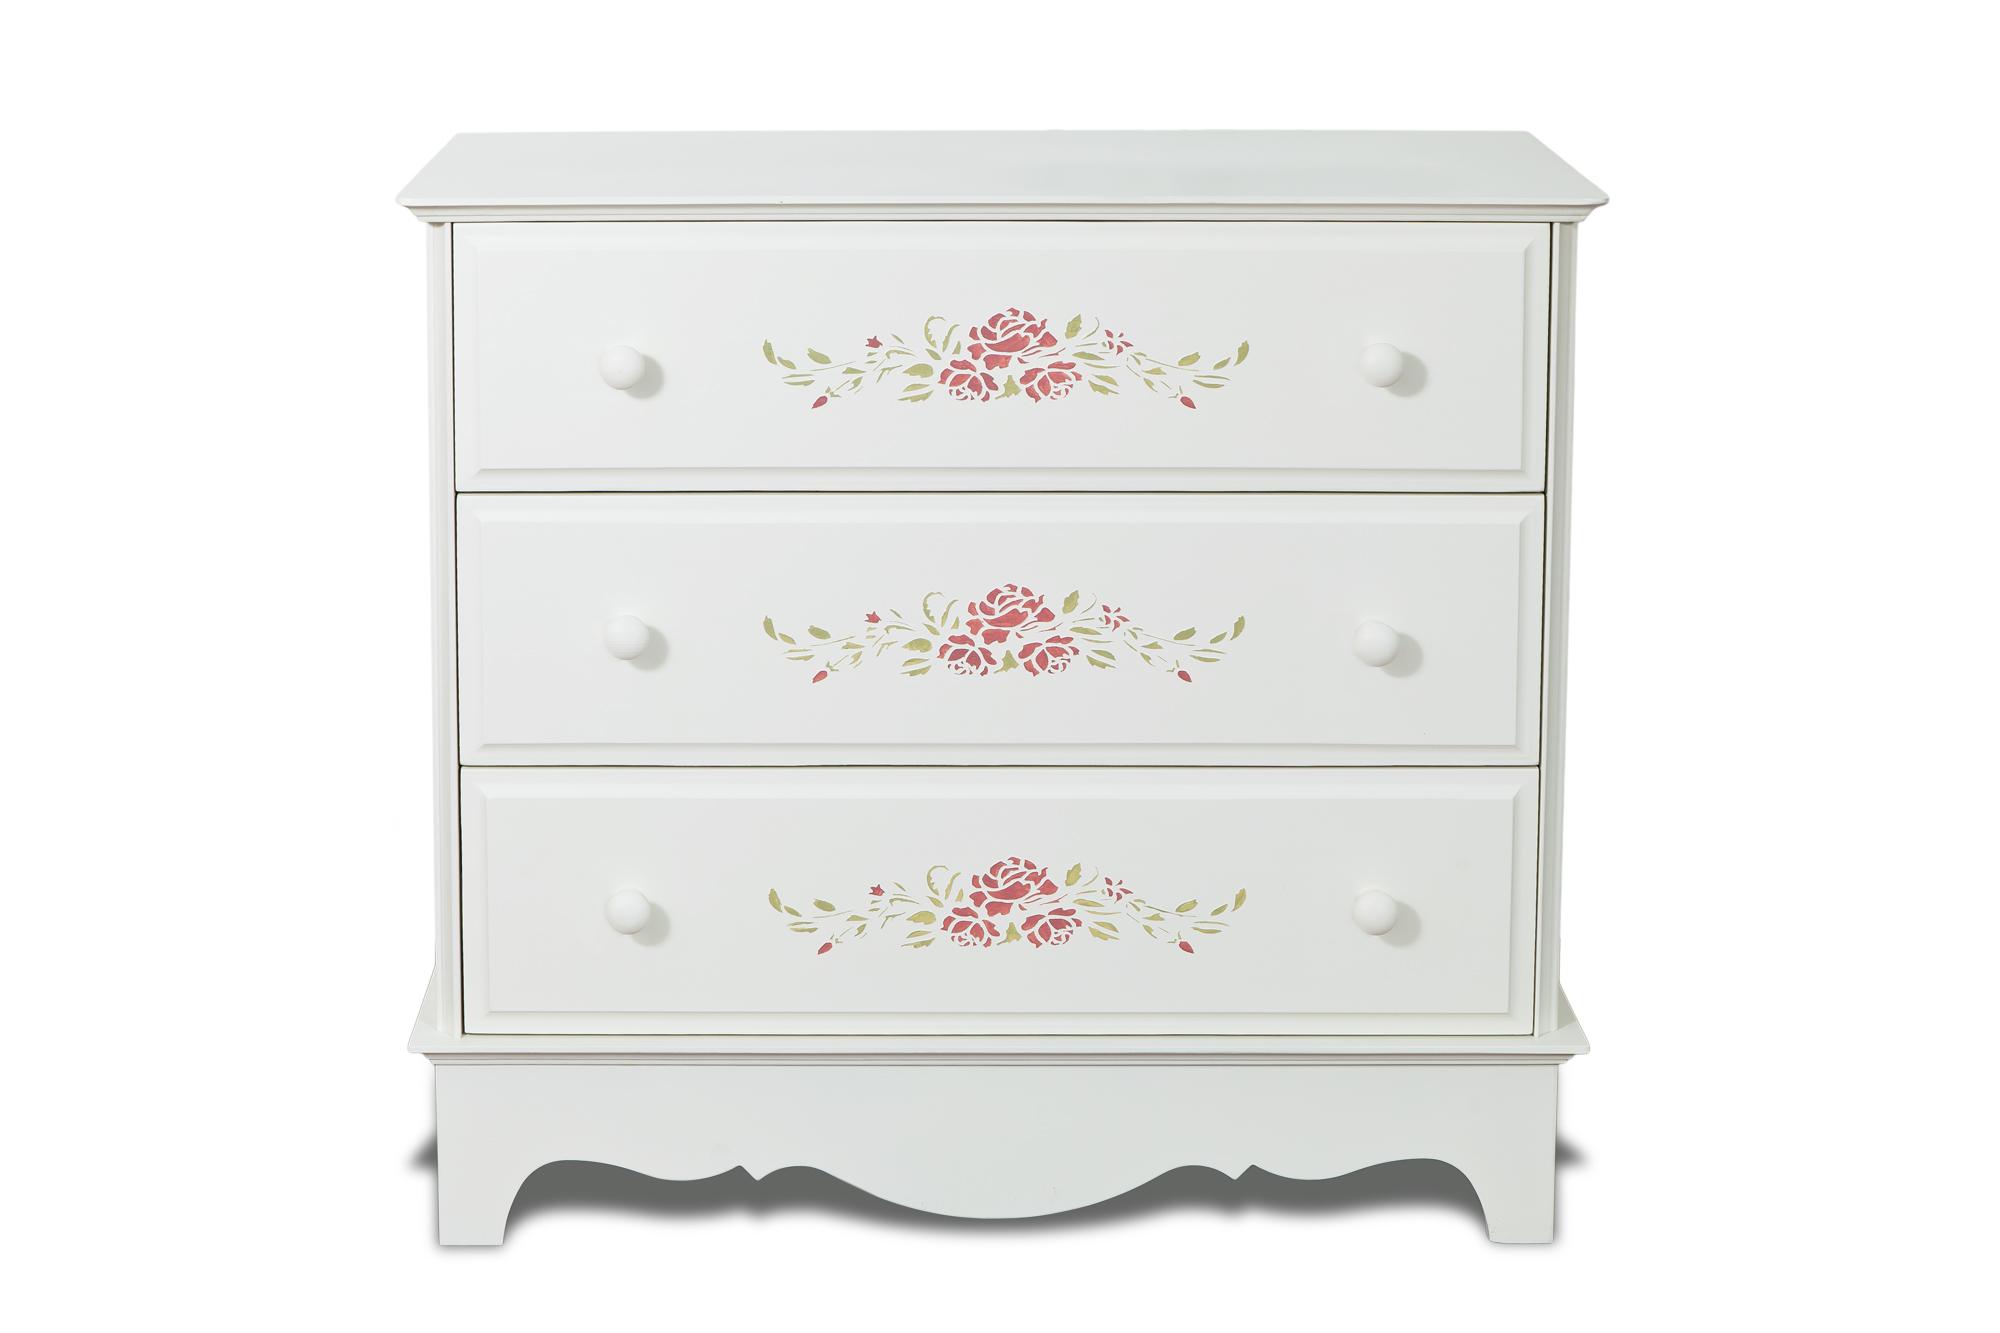 Комод Belle Fleur Color?Бельевые комоды<br>Отделка: Belle Fleur Color? - орнамент из роз.&amp;amp;nbsp;<br><br>Material: Береза<br>Width см: 92<br>Depth см: 42,5<br>Height см: 84